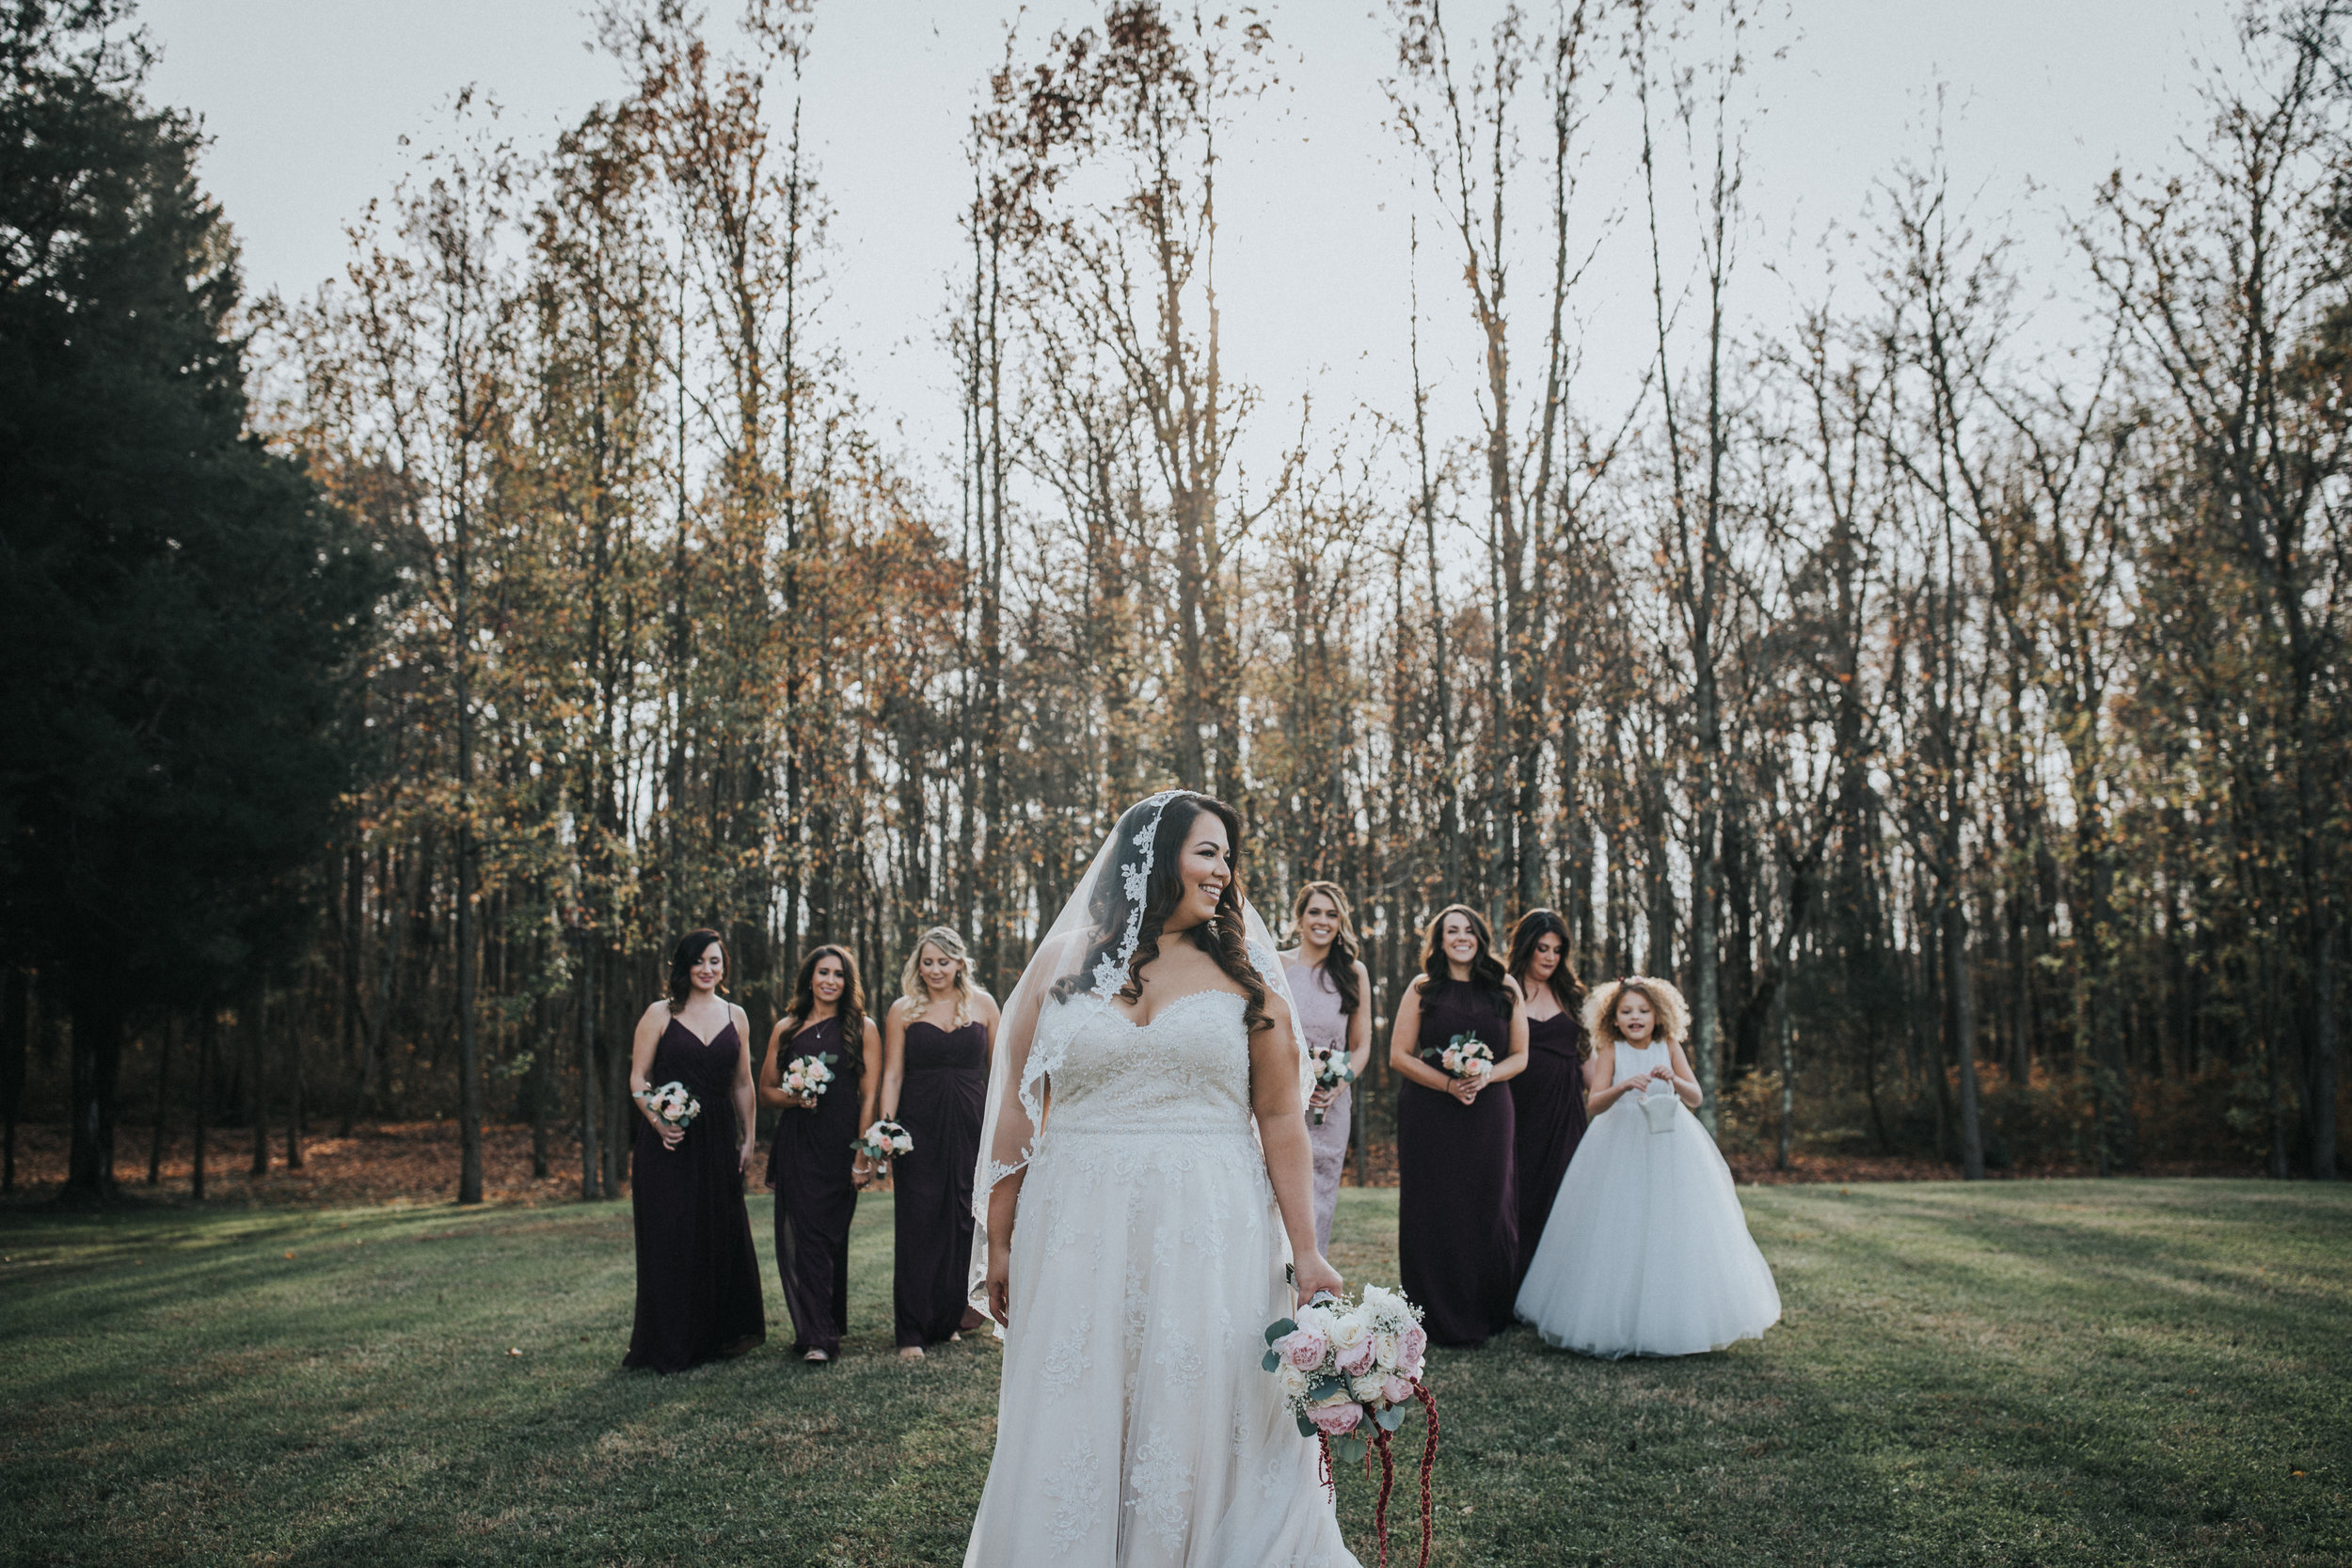 New-Jersey-Wedding-Photography-Brigalias-Deanna&Darryl-BridalParty-28.jpg